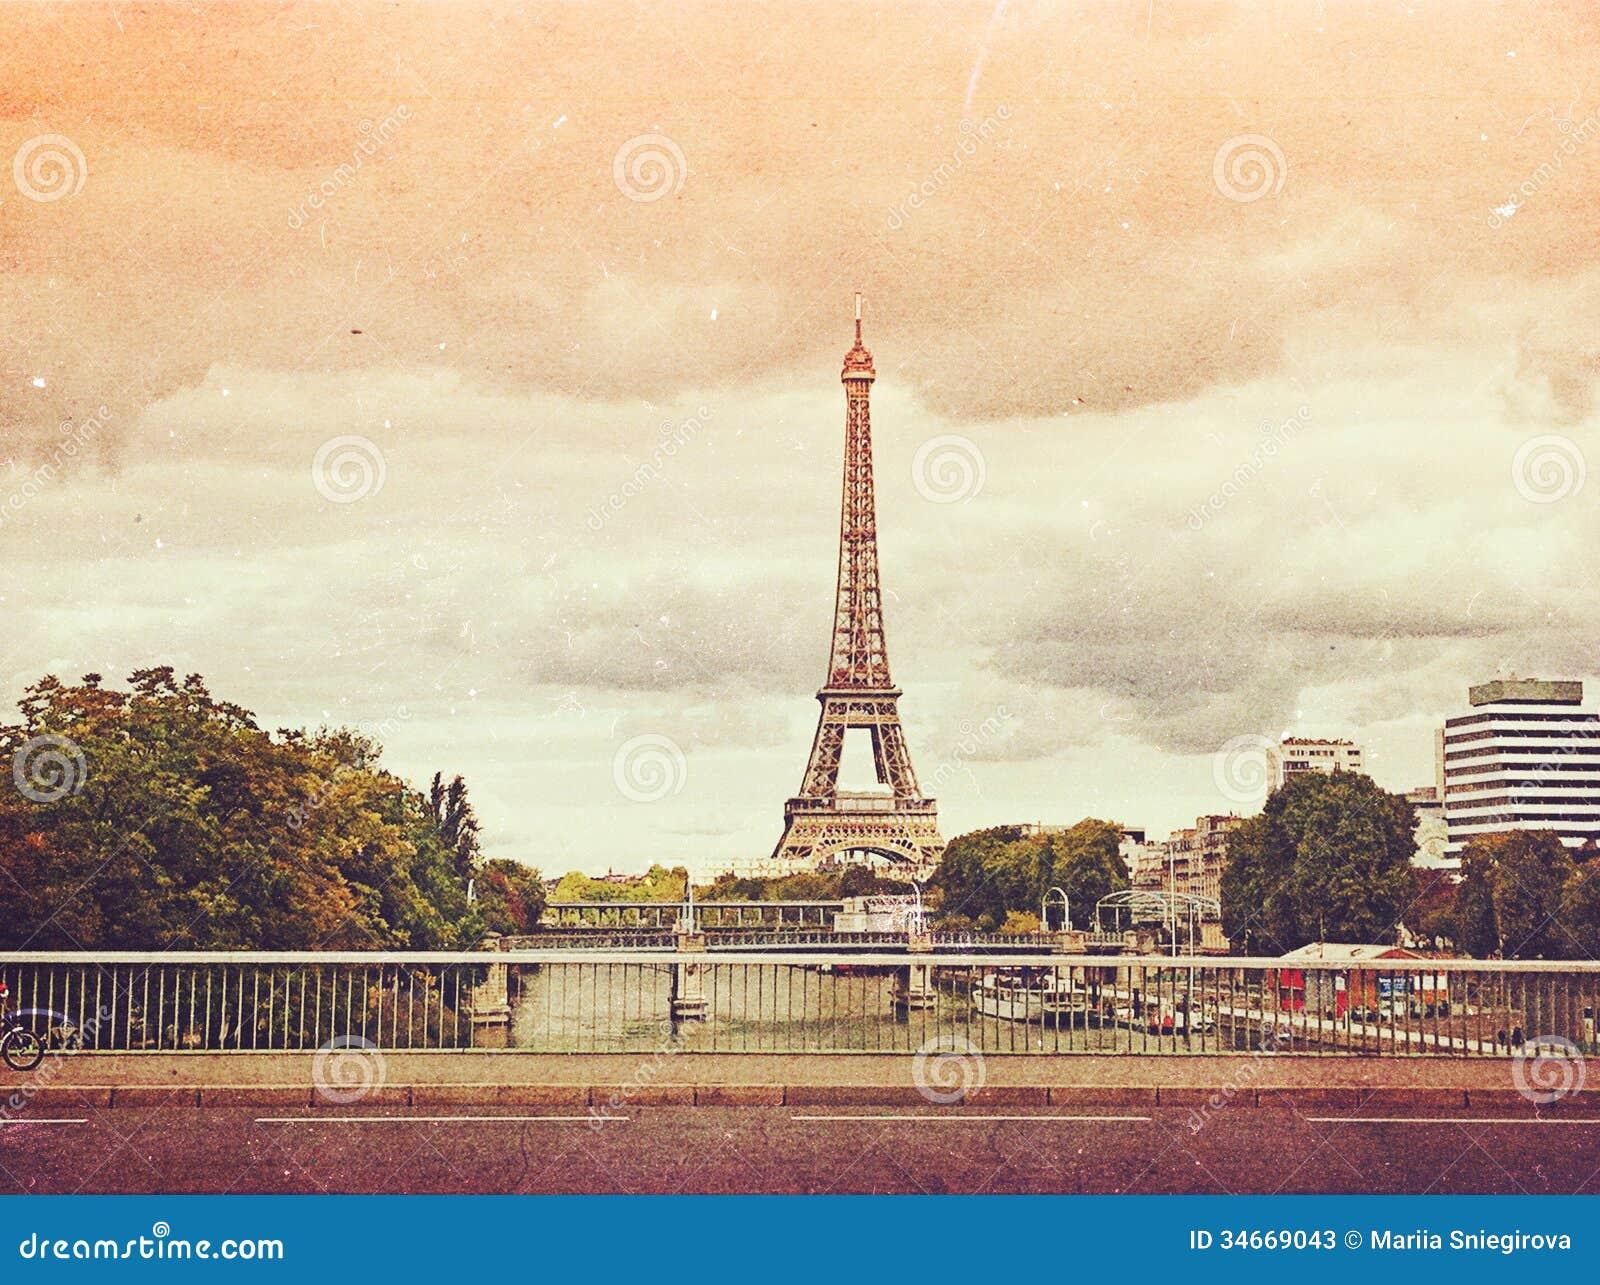 retro photo with paris france vintage stock photos